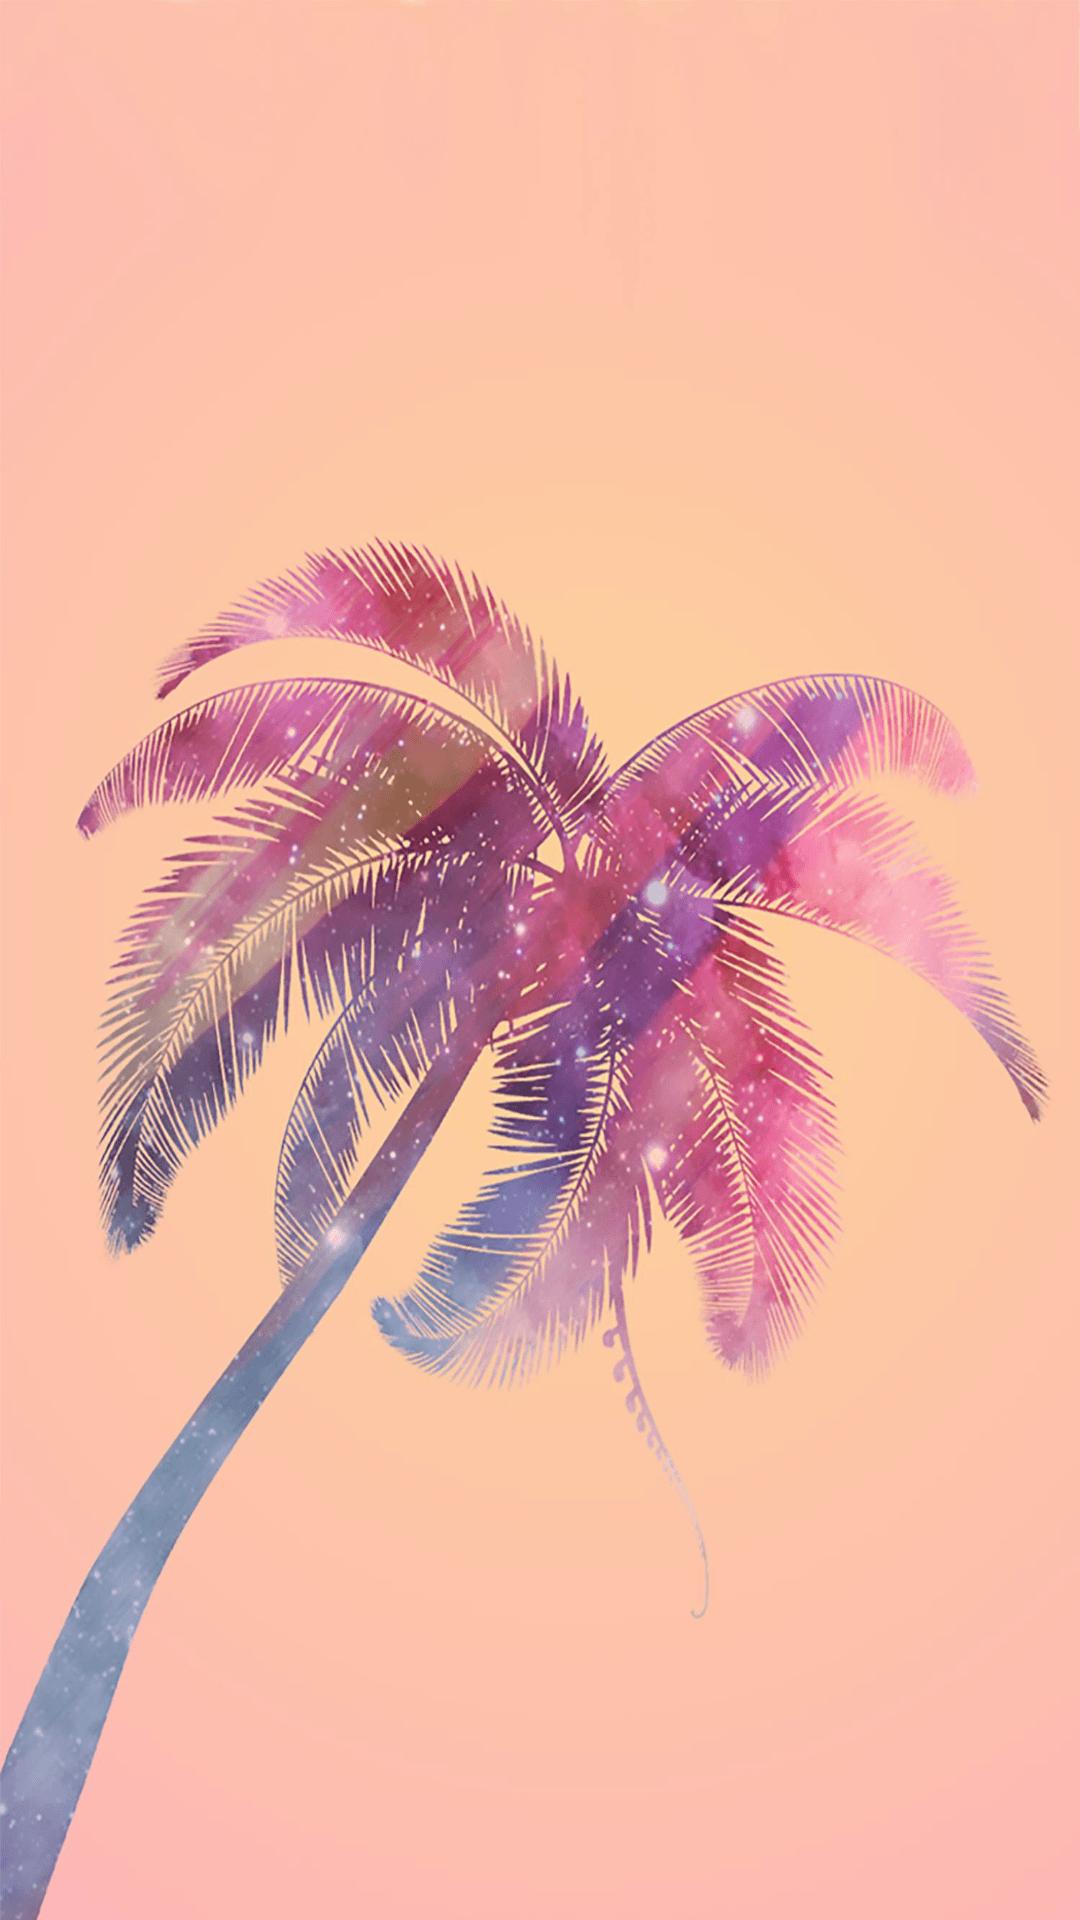 Pink Tree Sky Violet Palm Tree Purple In 2020 Pink Wallpaper Iphone Palm Trees Wallpaper Wallpaper Iphone Christmas